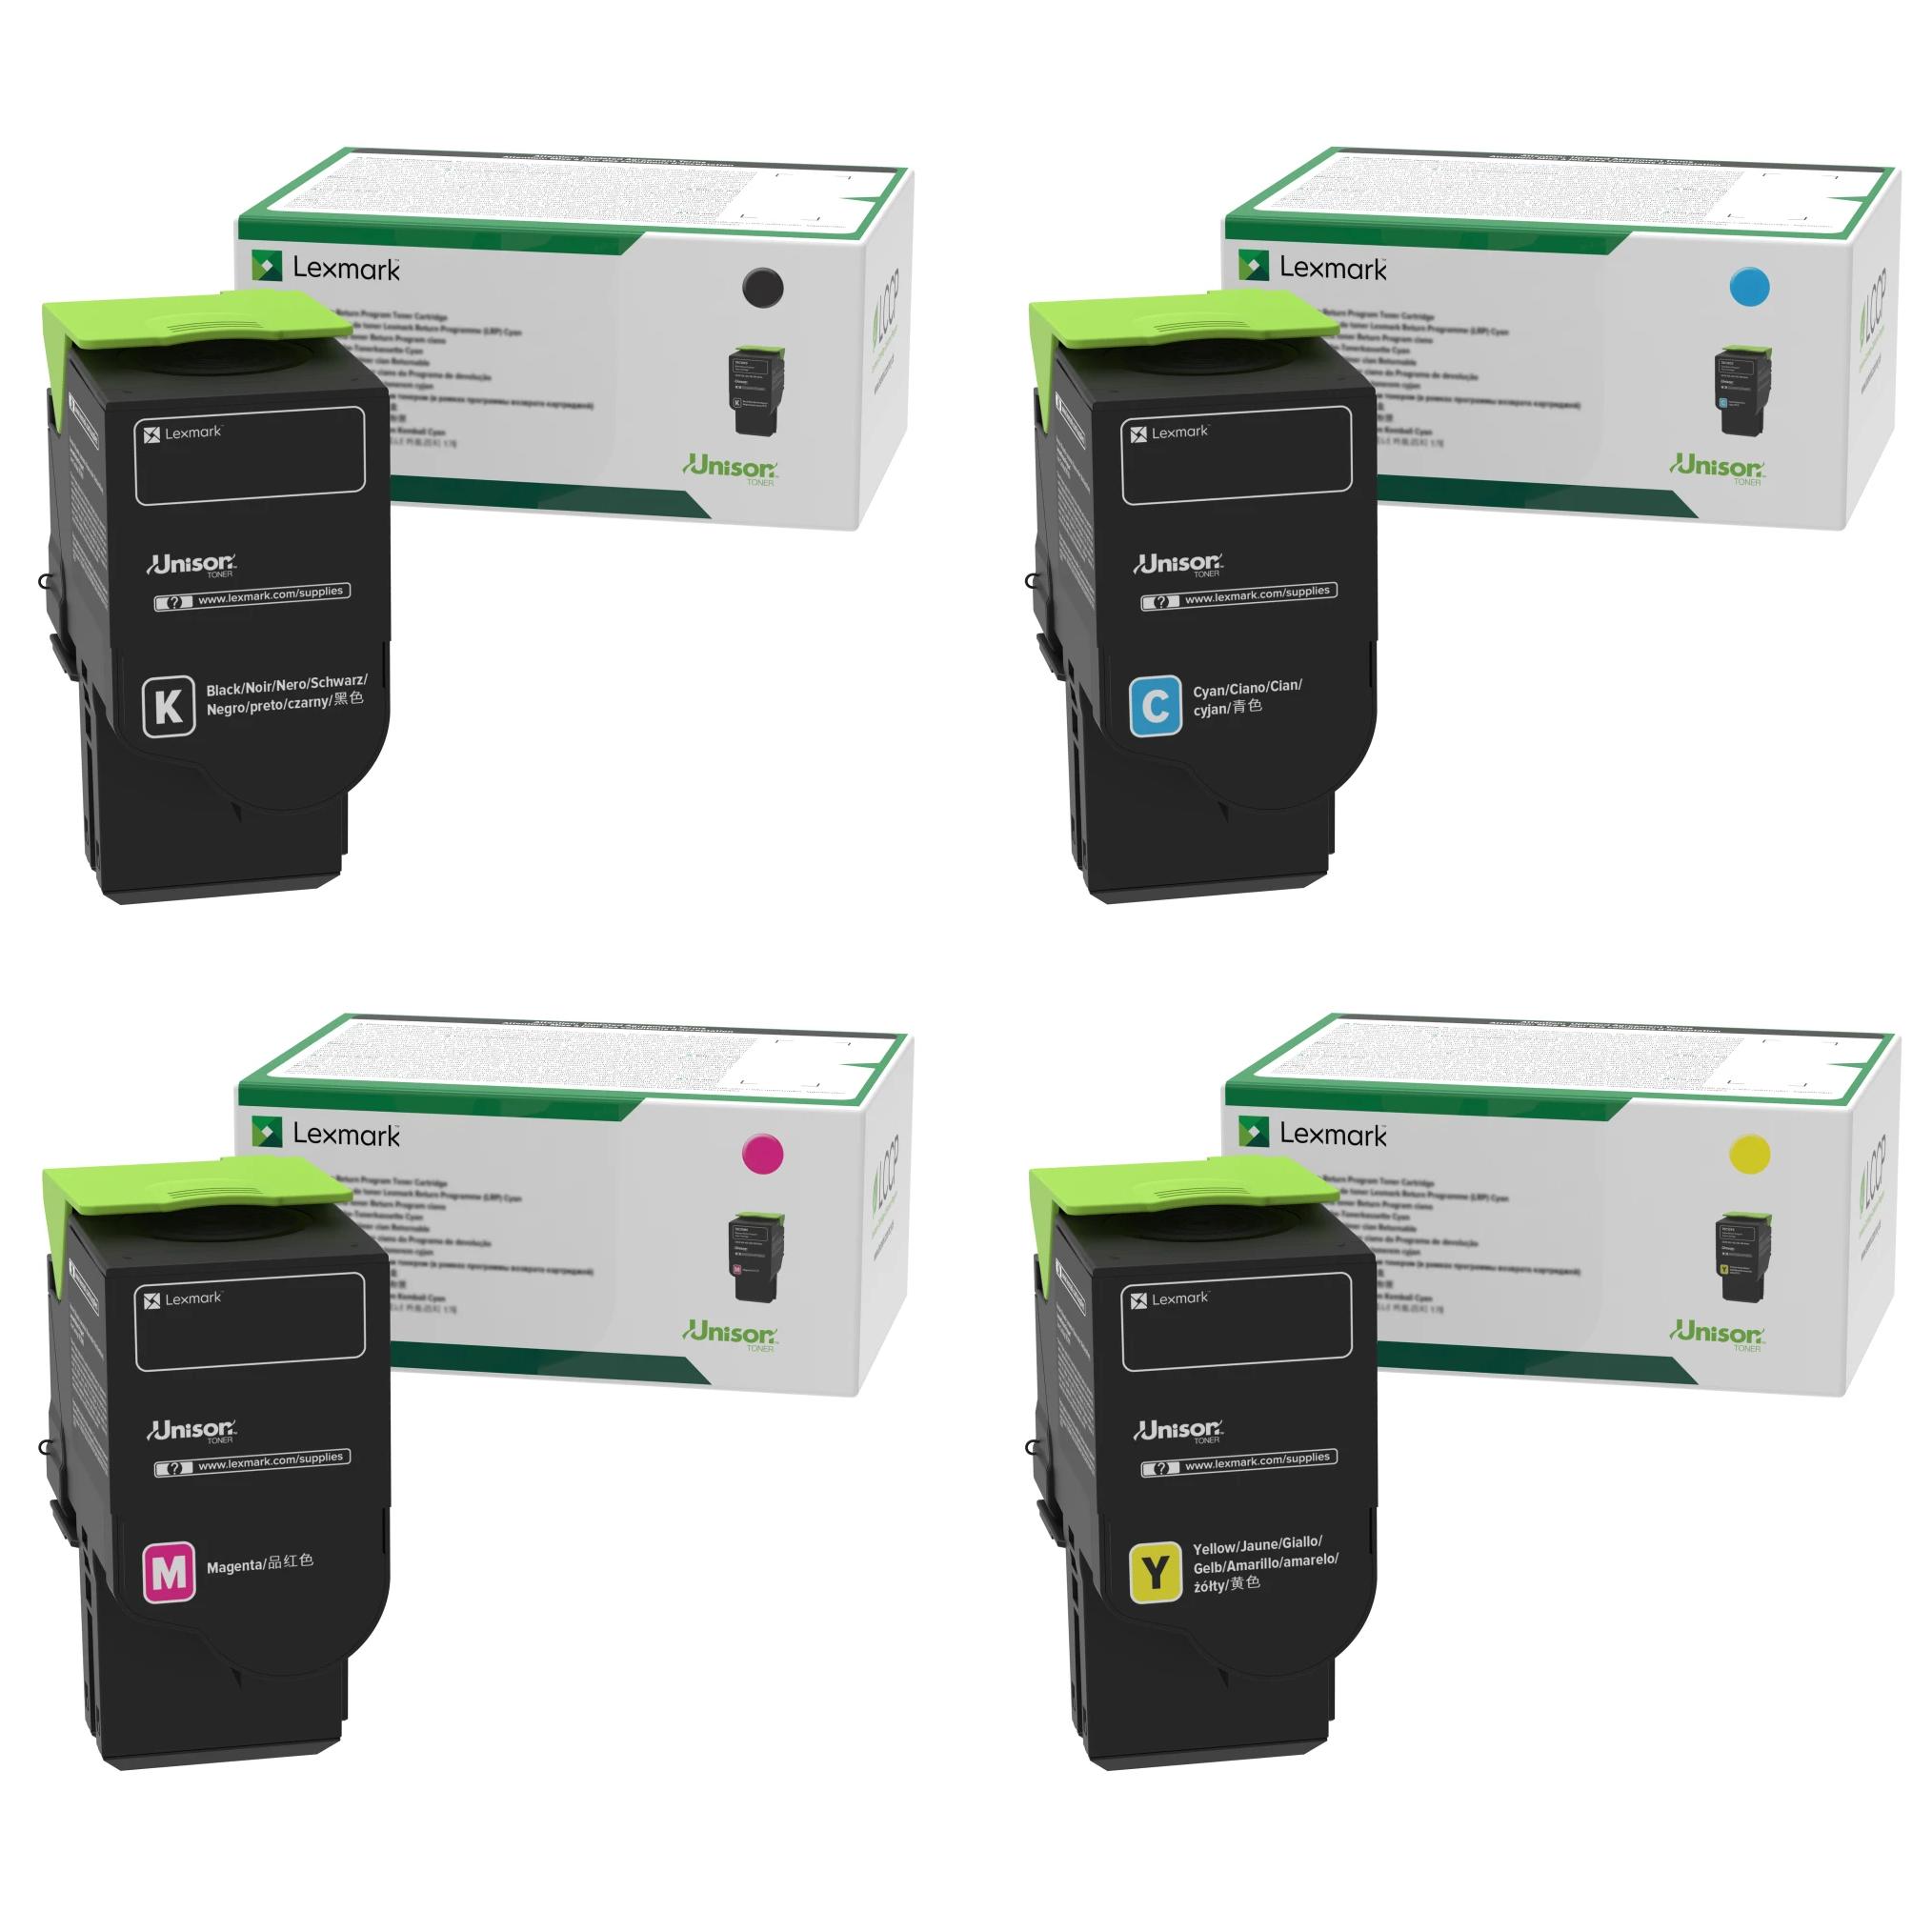 Lexmark 78C0X Set | 78C10C0 78C10K0 78C10M0 78C10Y0 | Original Lexmark Toner Cartridges – Black, Cyan, Magenta, Yellow